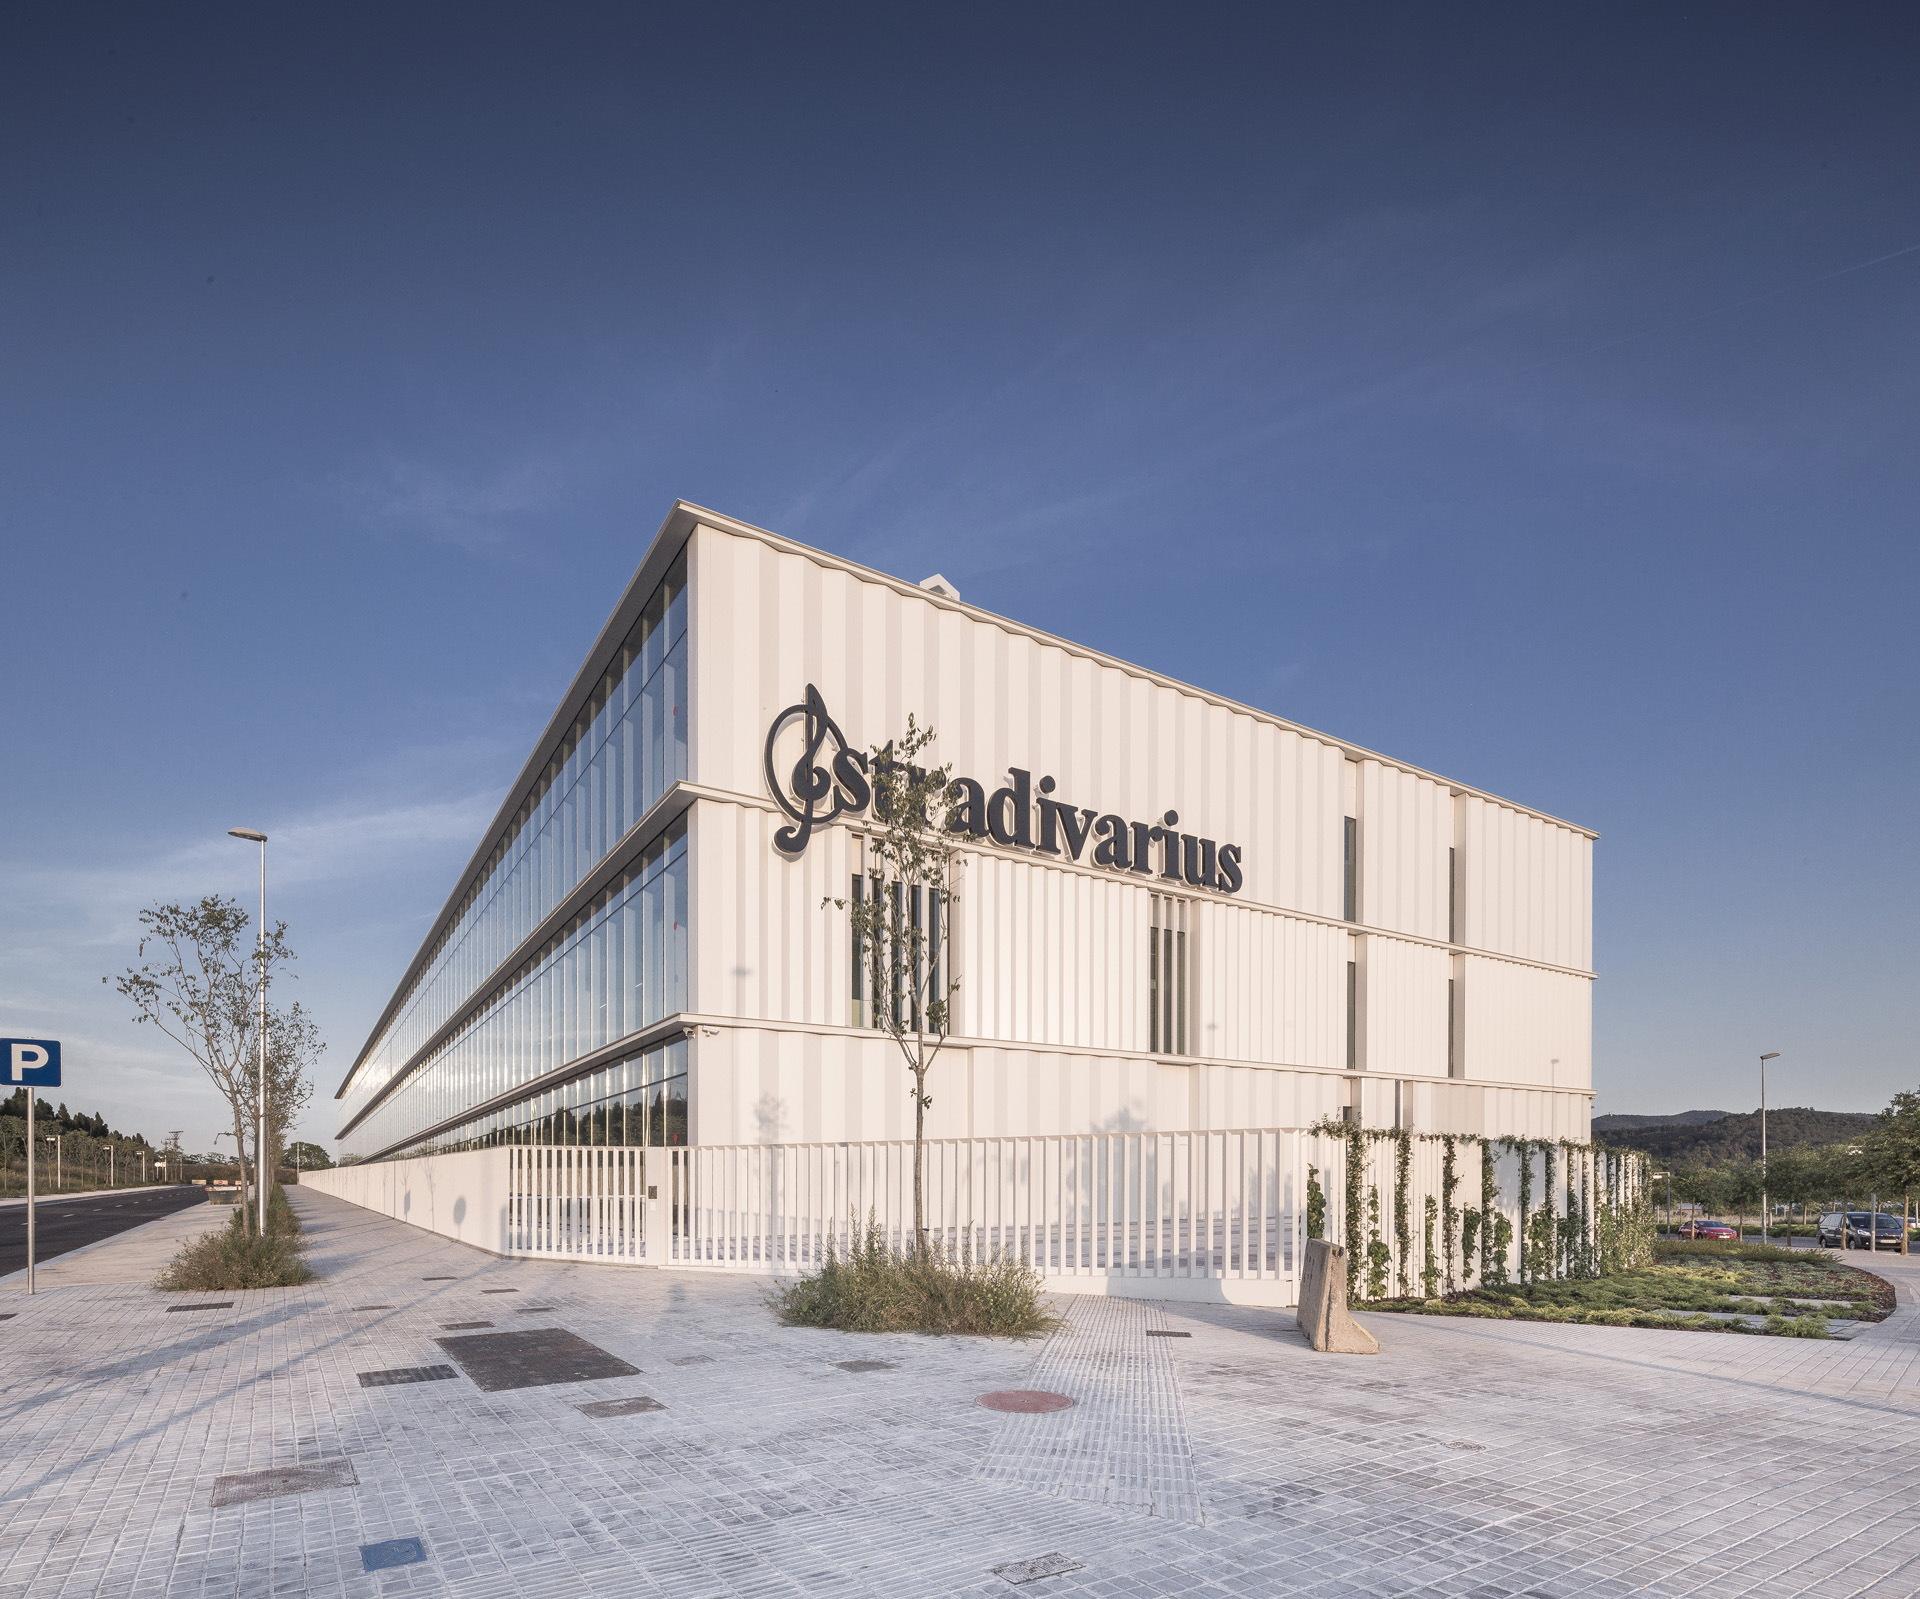 Batlle I Roig: neuer Sitz von Stradivarius in Cerdanyola del Vallès